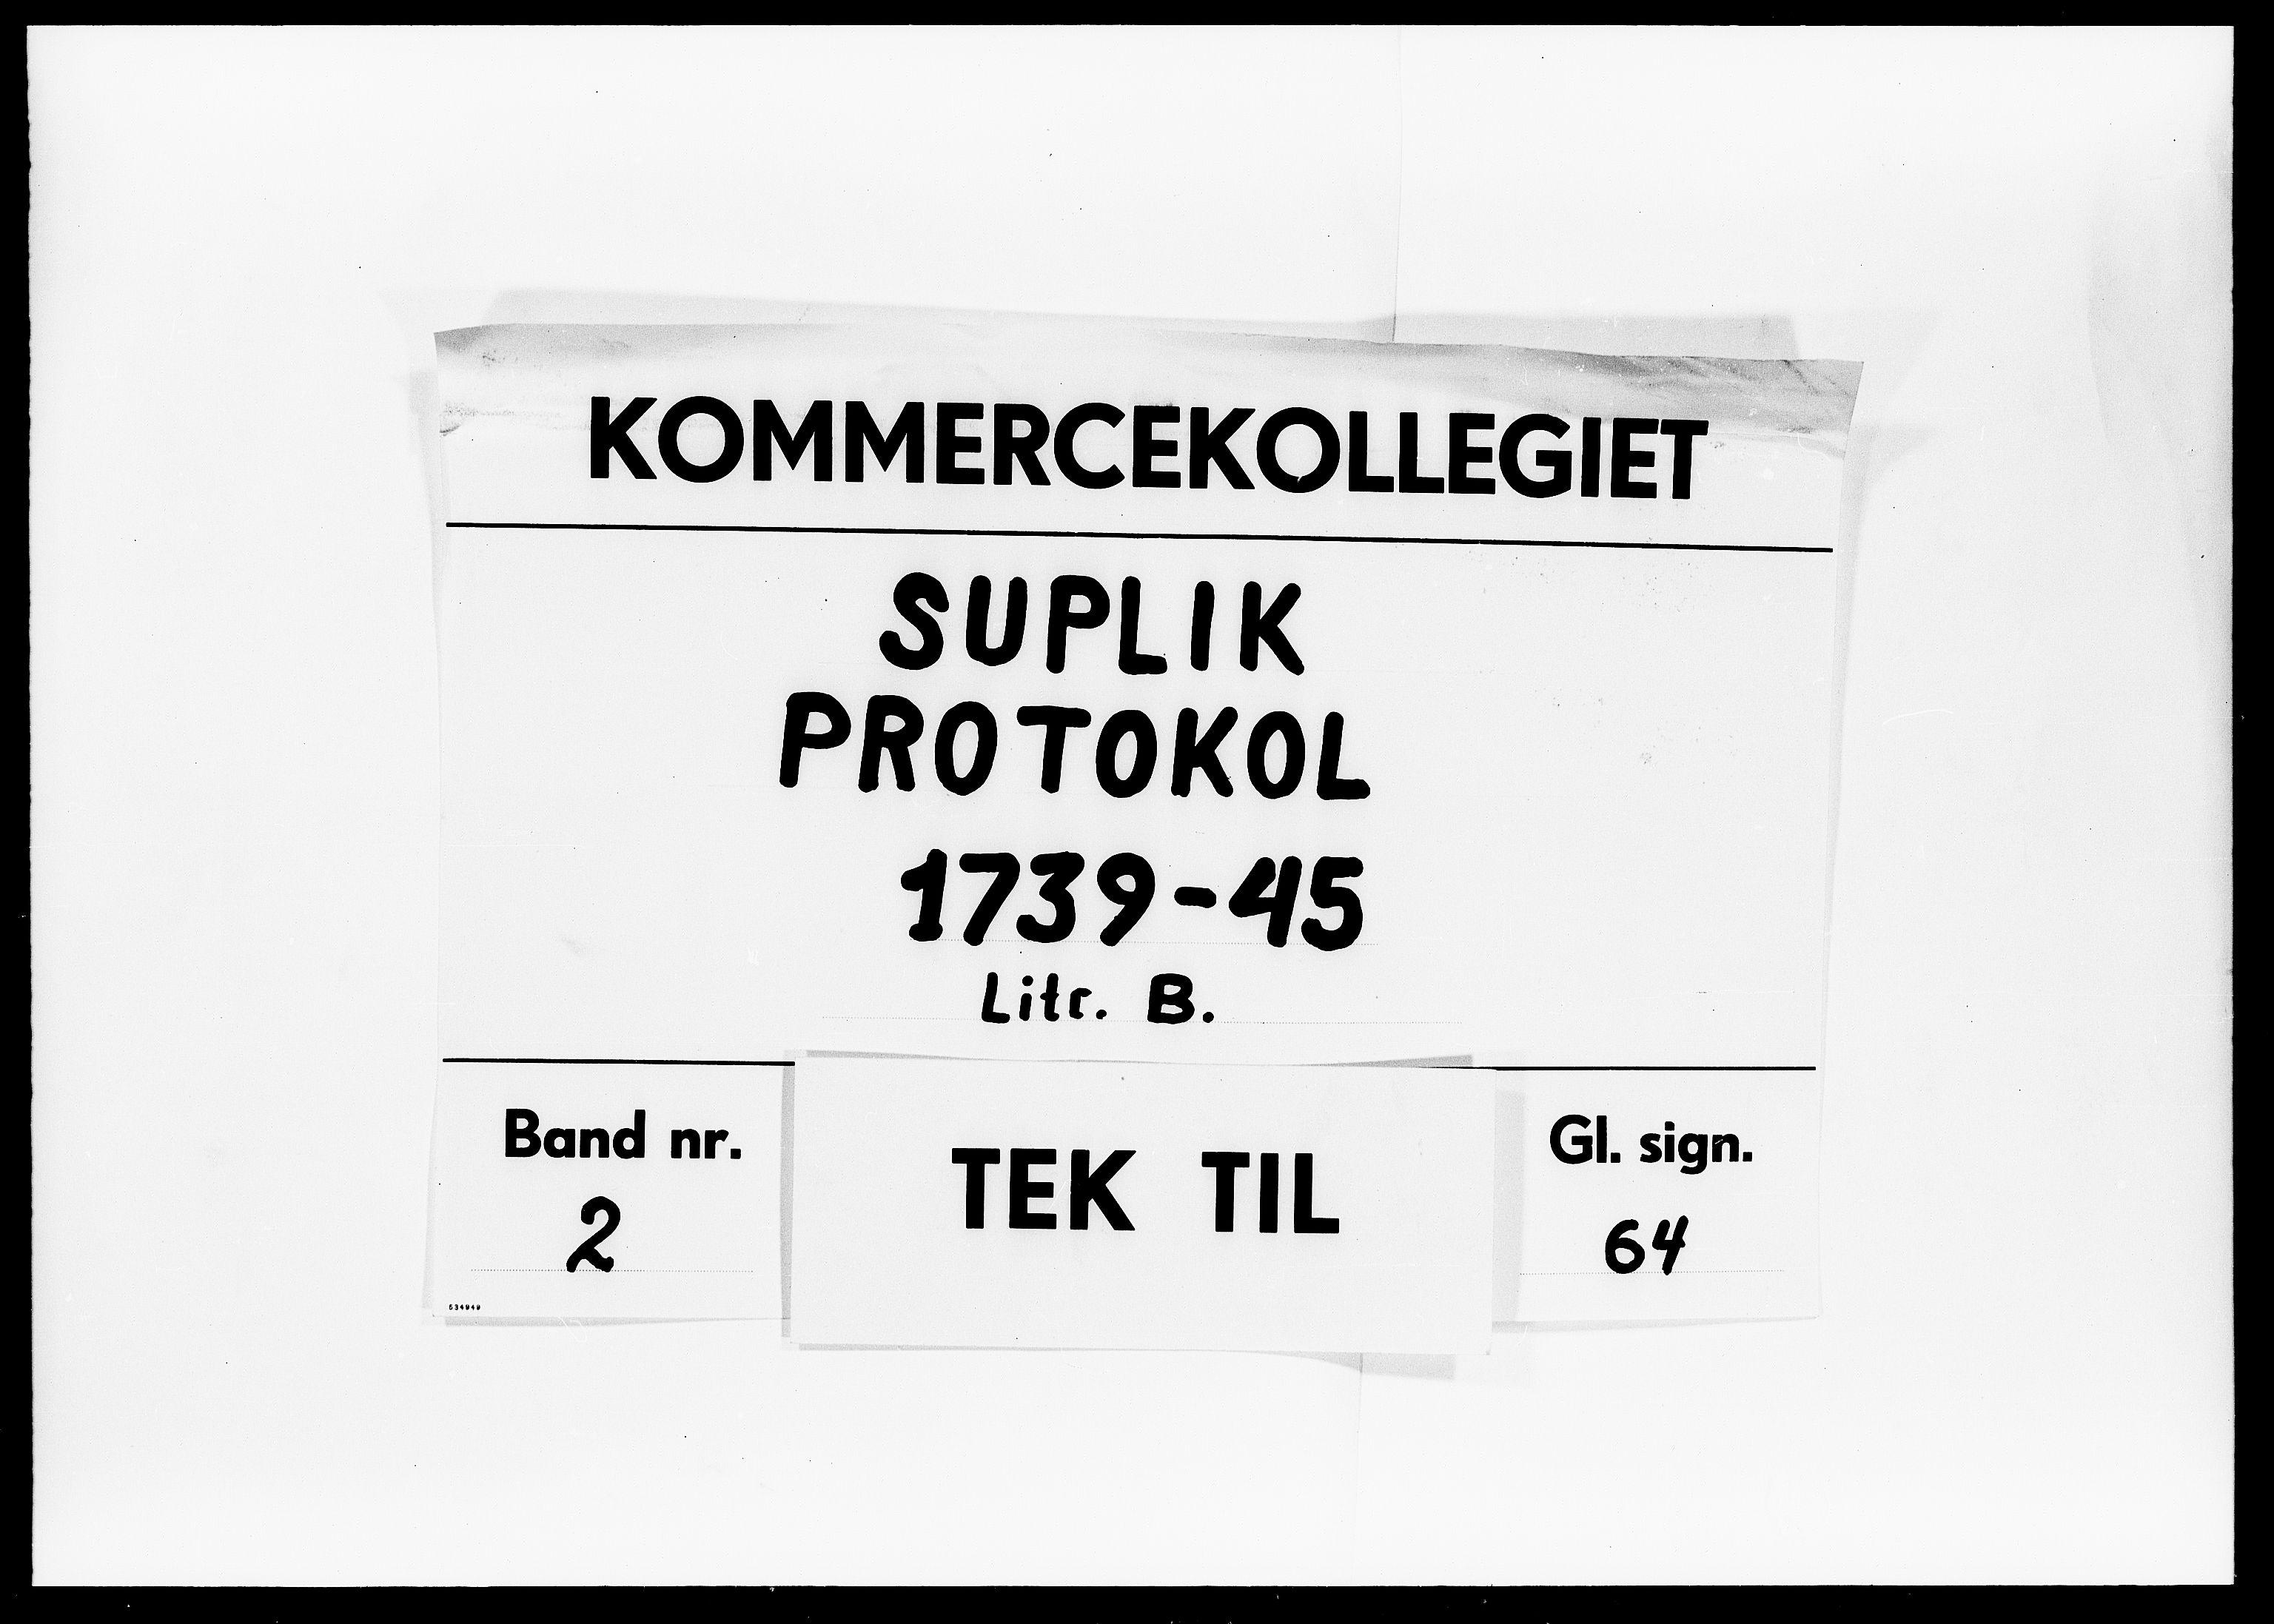 DRA, Kommercekollegiet, Dansk-Norske Sekretariat, -/32: Suplik Protokol B, 1739-1745